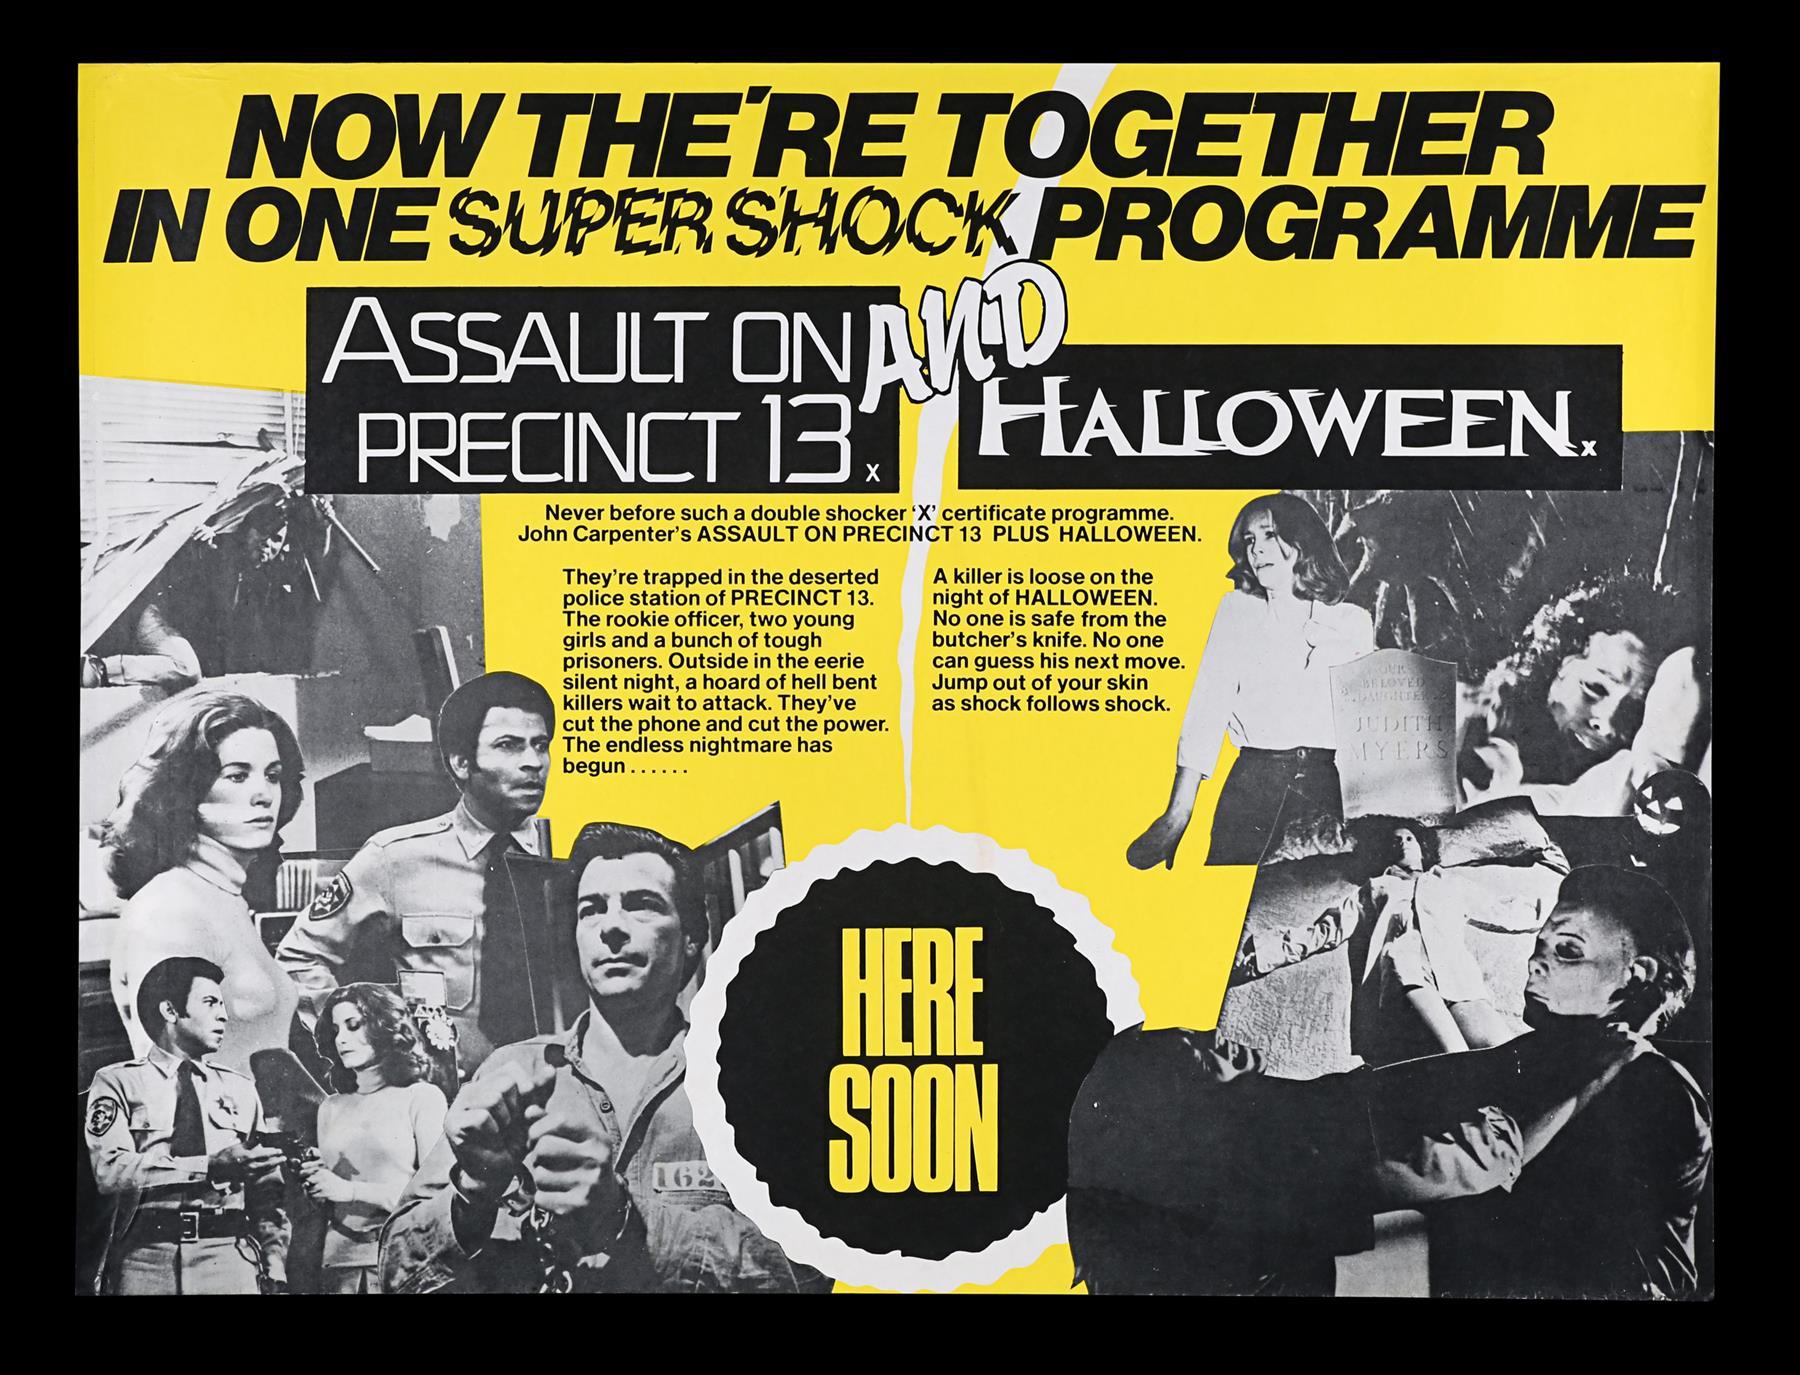 ASSAULT ON PRECINCT 13 (1976), HALLOWEEN (1979) - Two UK Quads, 1979 - Image 2 of 5